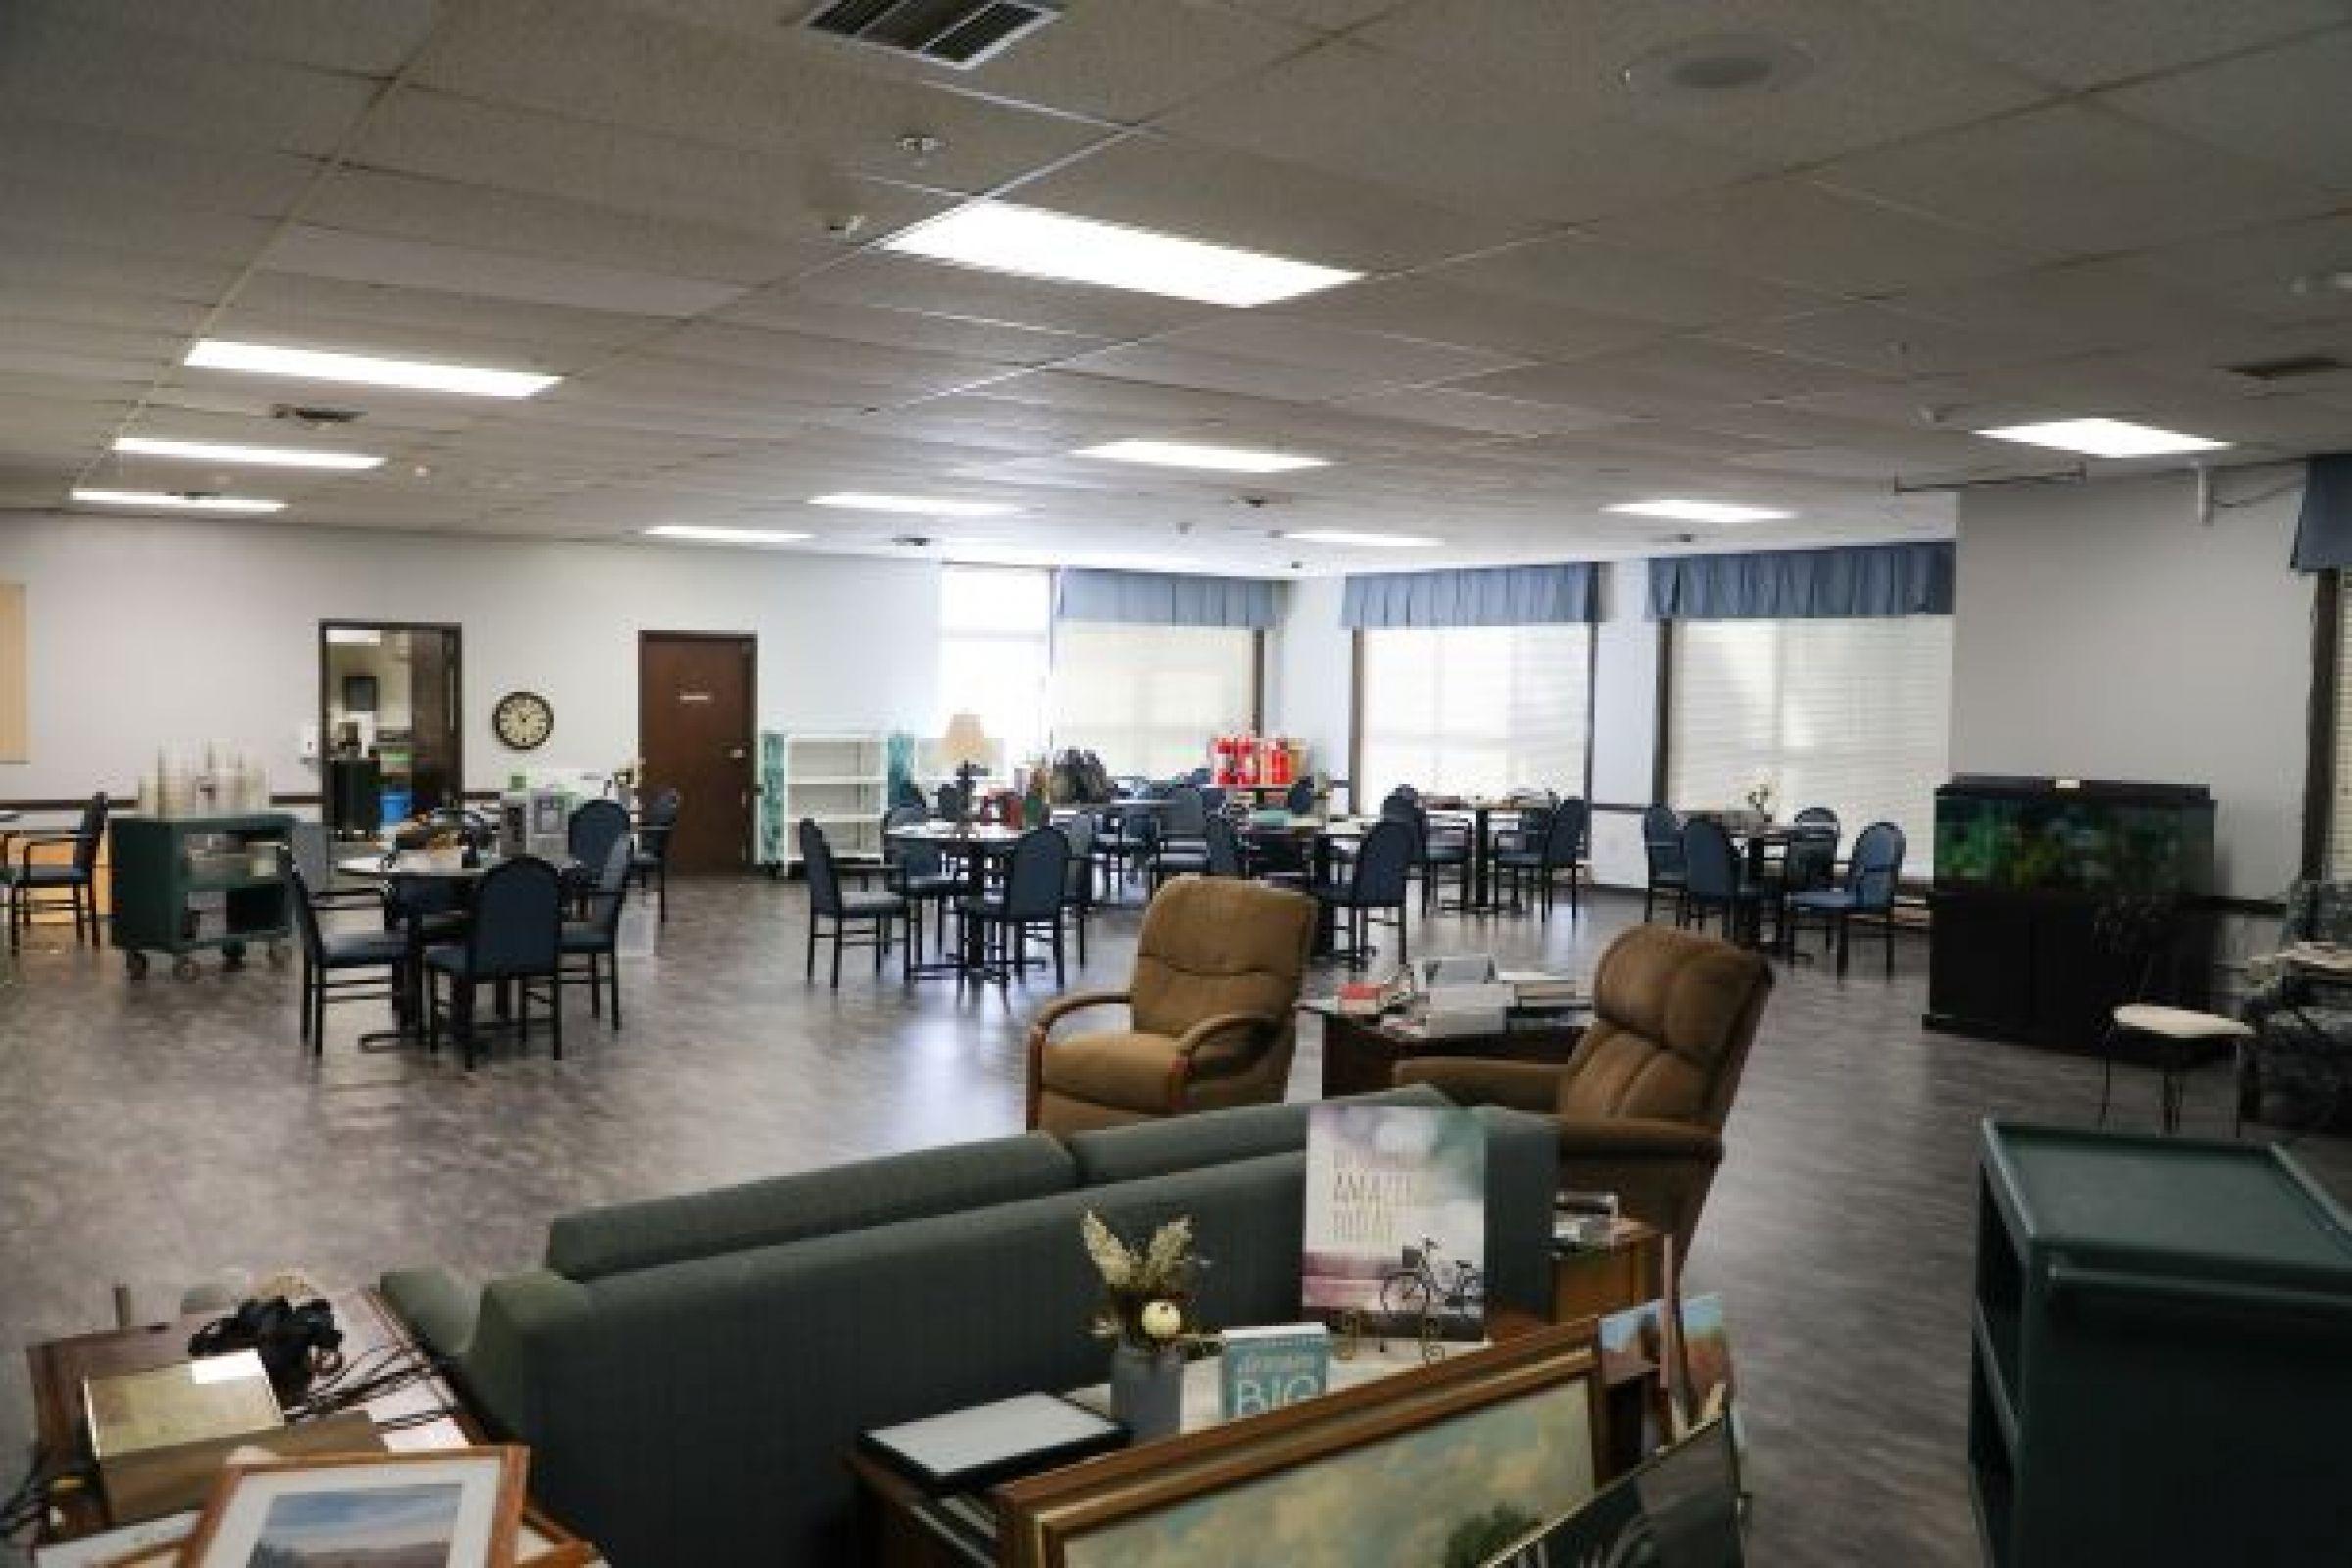 14742-afton-care-center-afton-iowa-2-2019-10-23-173242.jpg